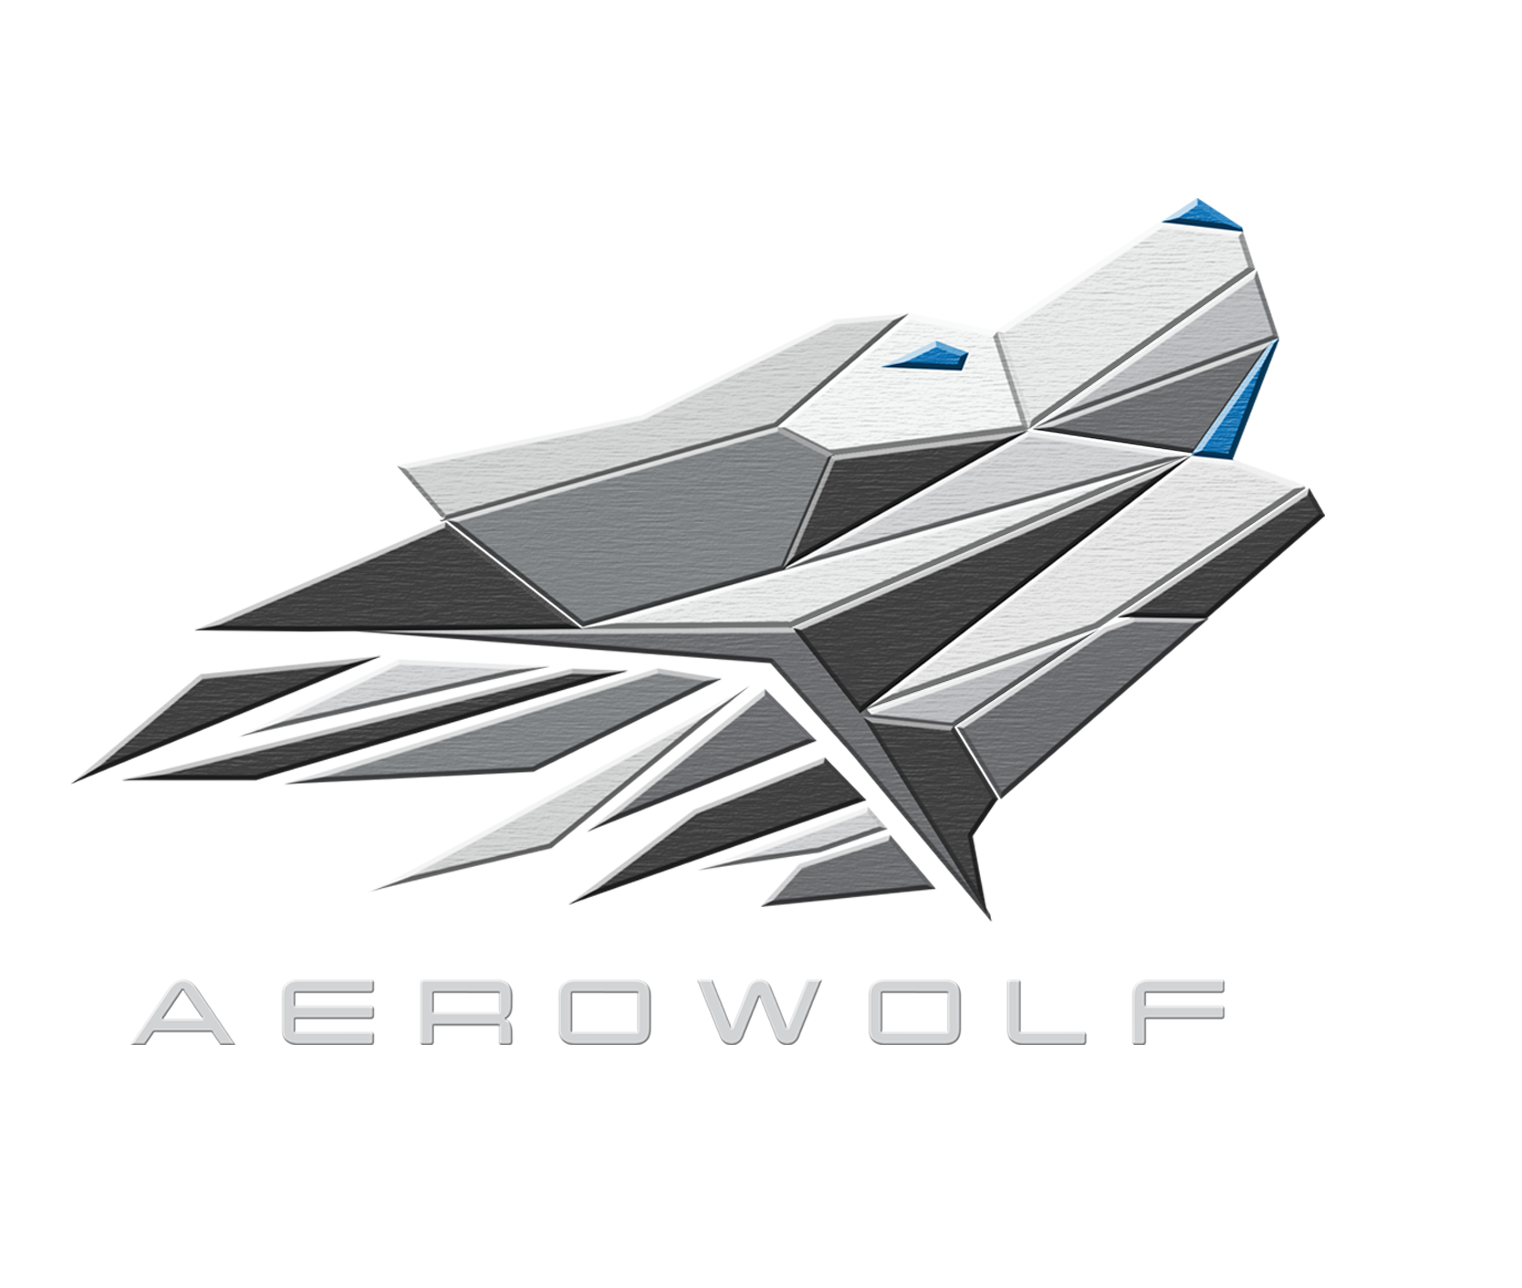 Aerowolf logo